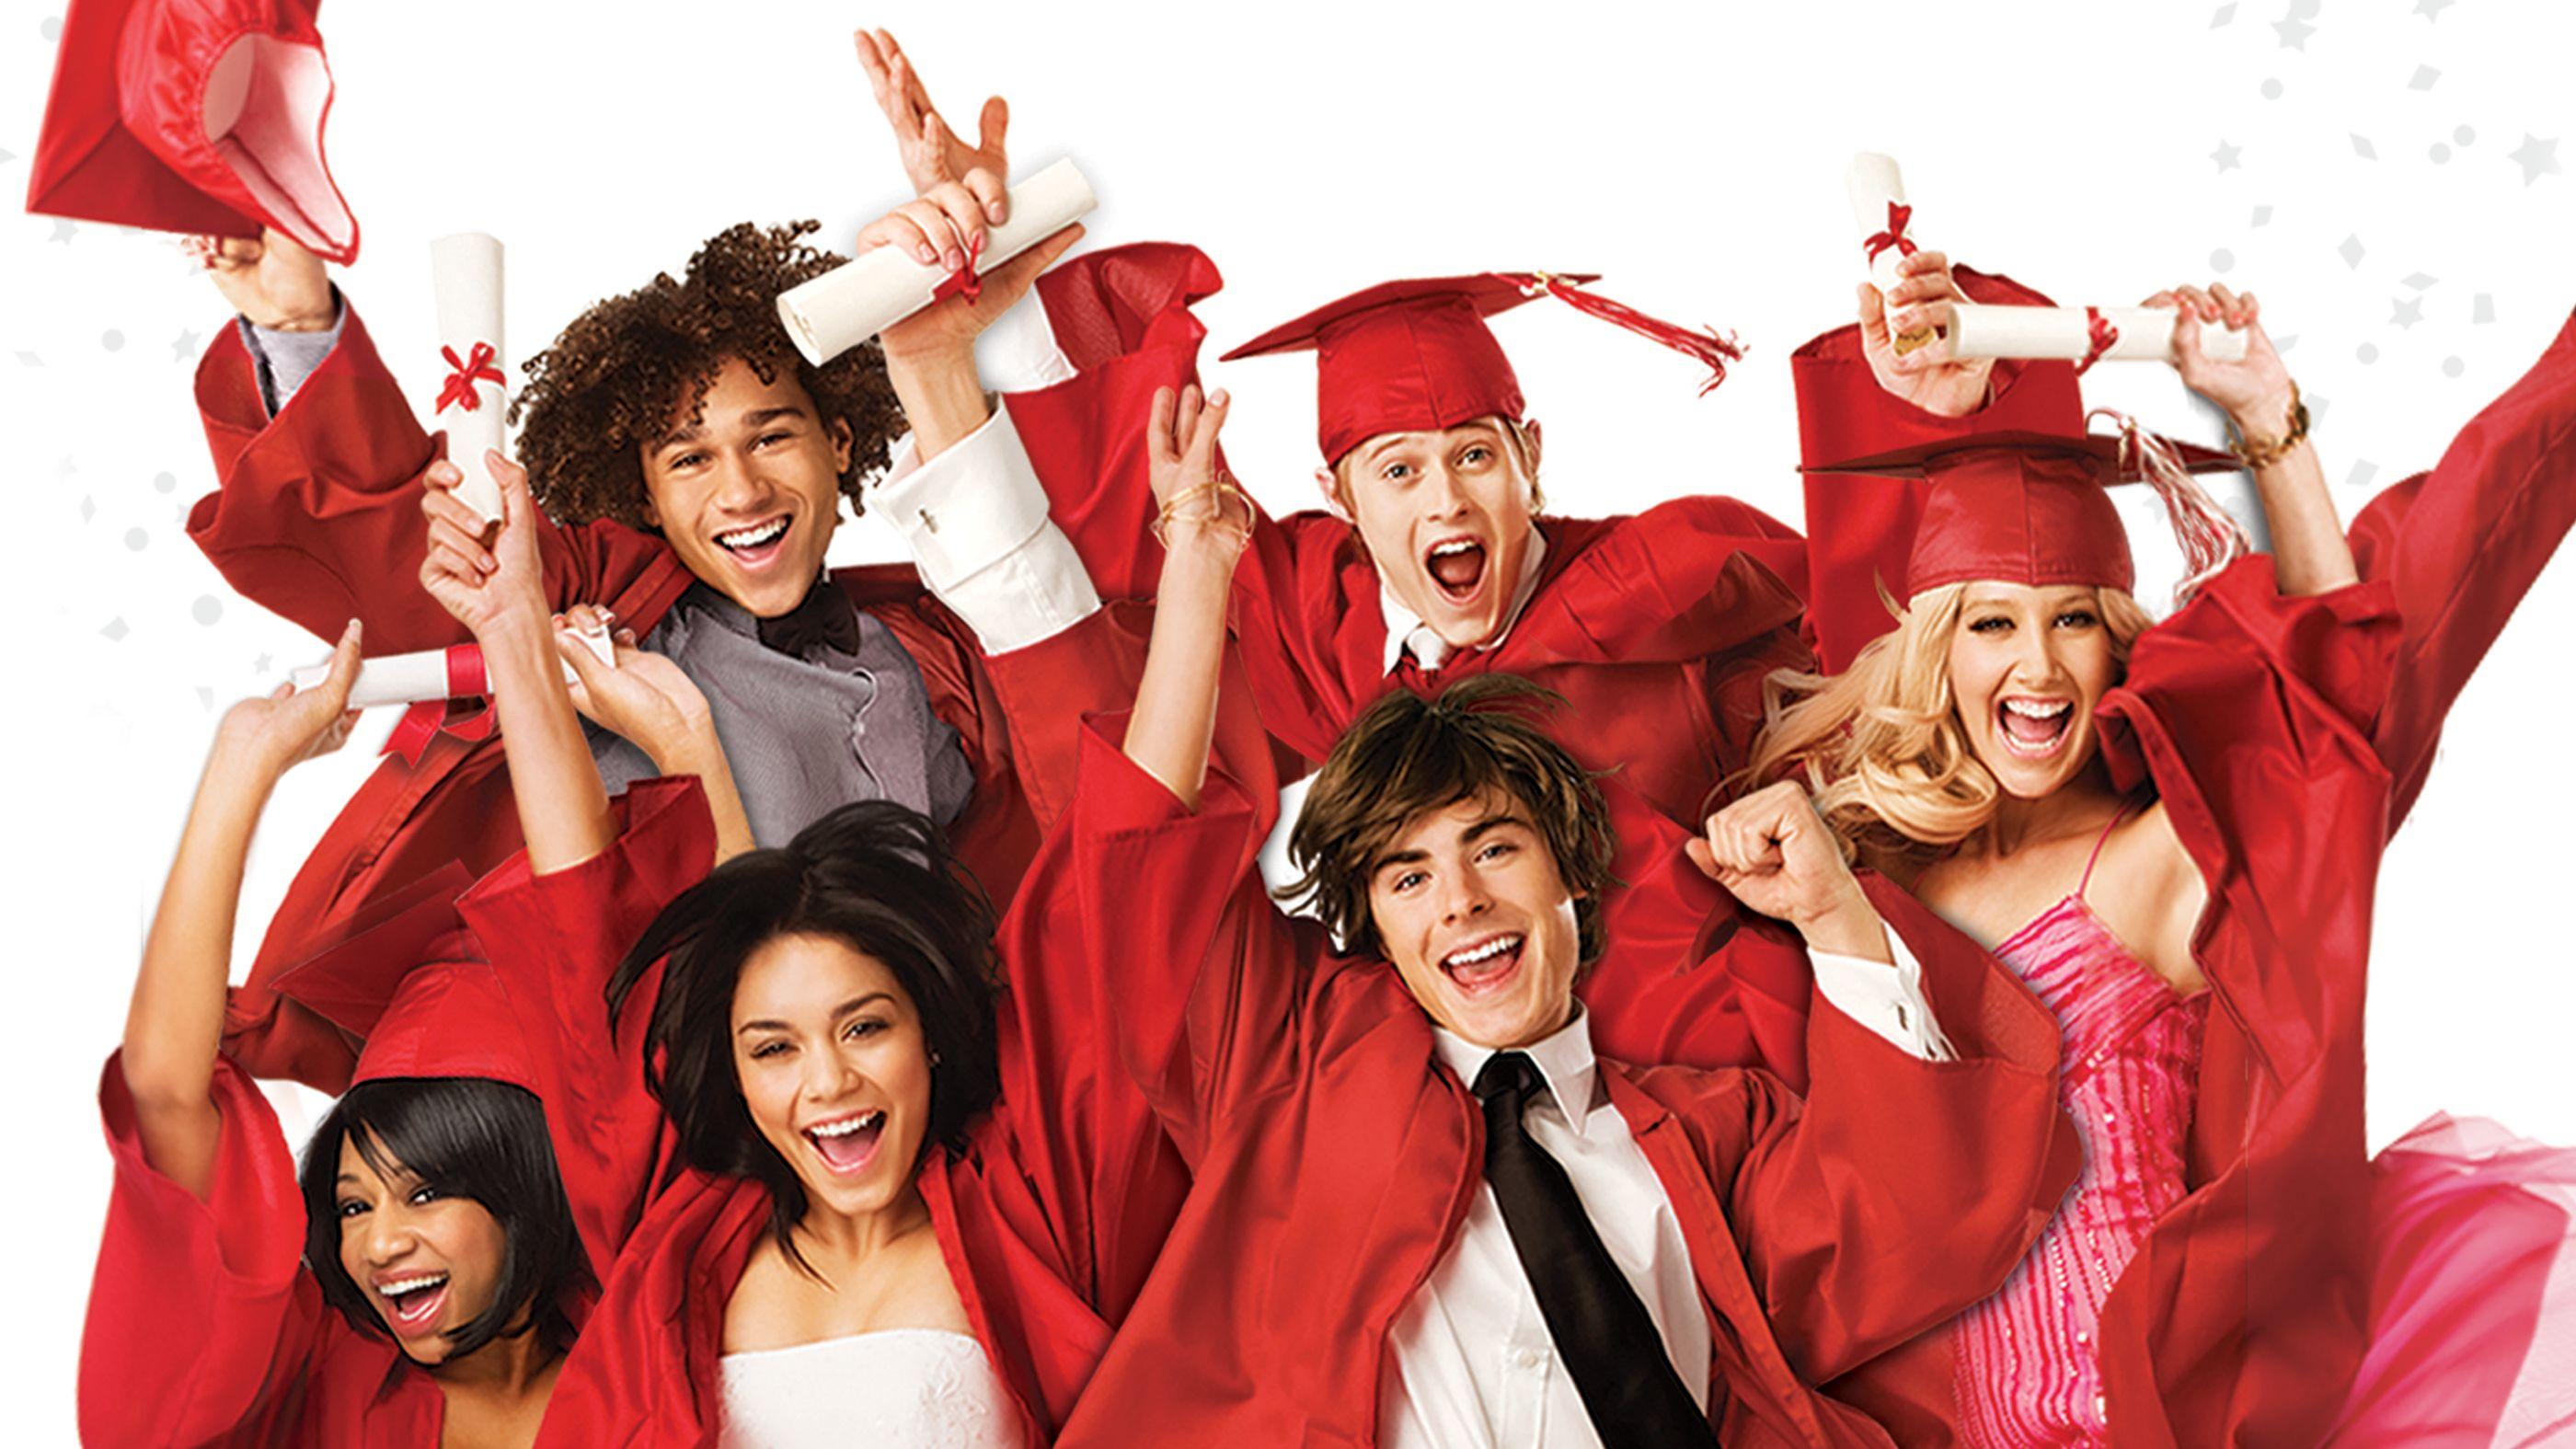 high school musical 2 torrent download 720p